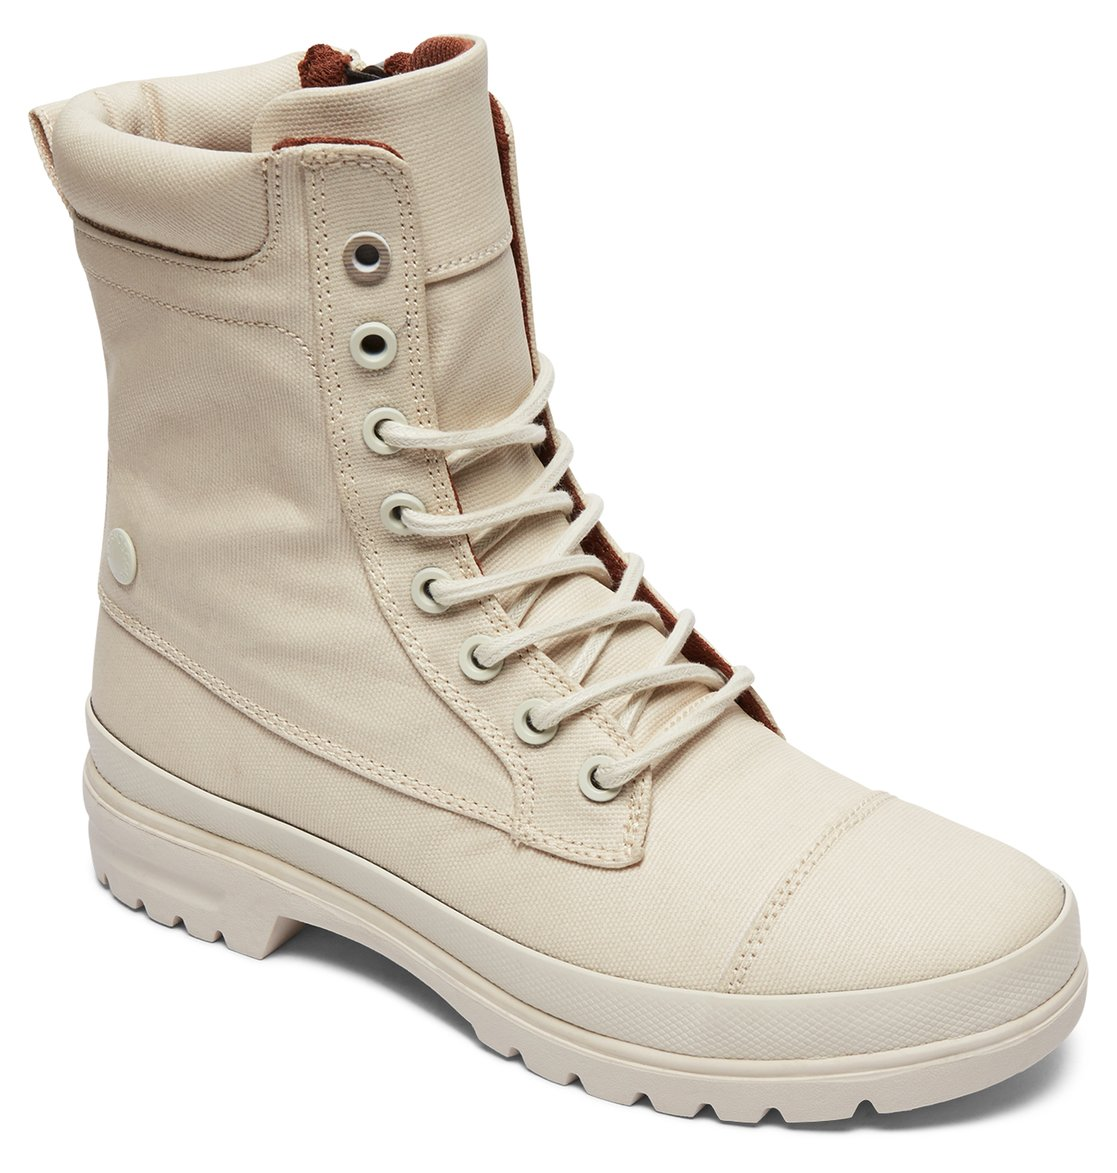 DC Shoes Amnesti TX SE - Boots - Bottes - Femme - US 10 / UK 8 / EU 42 - Blanc